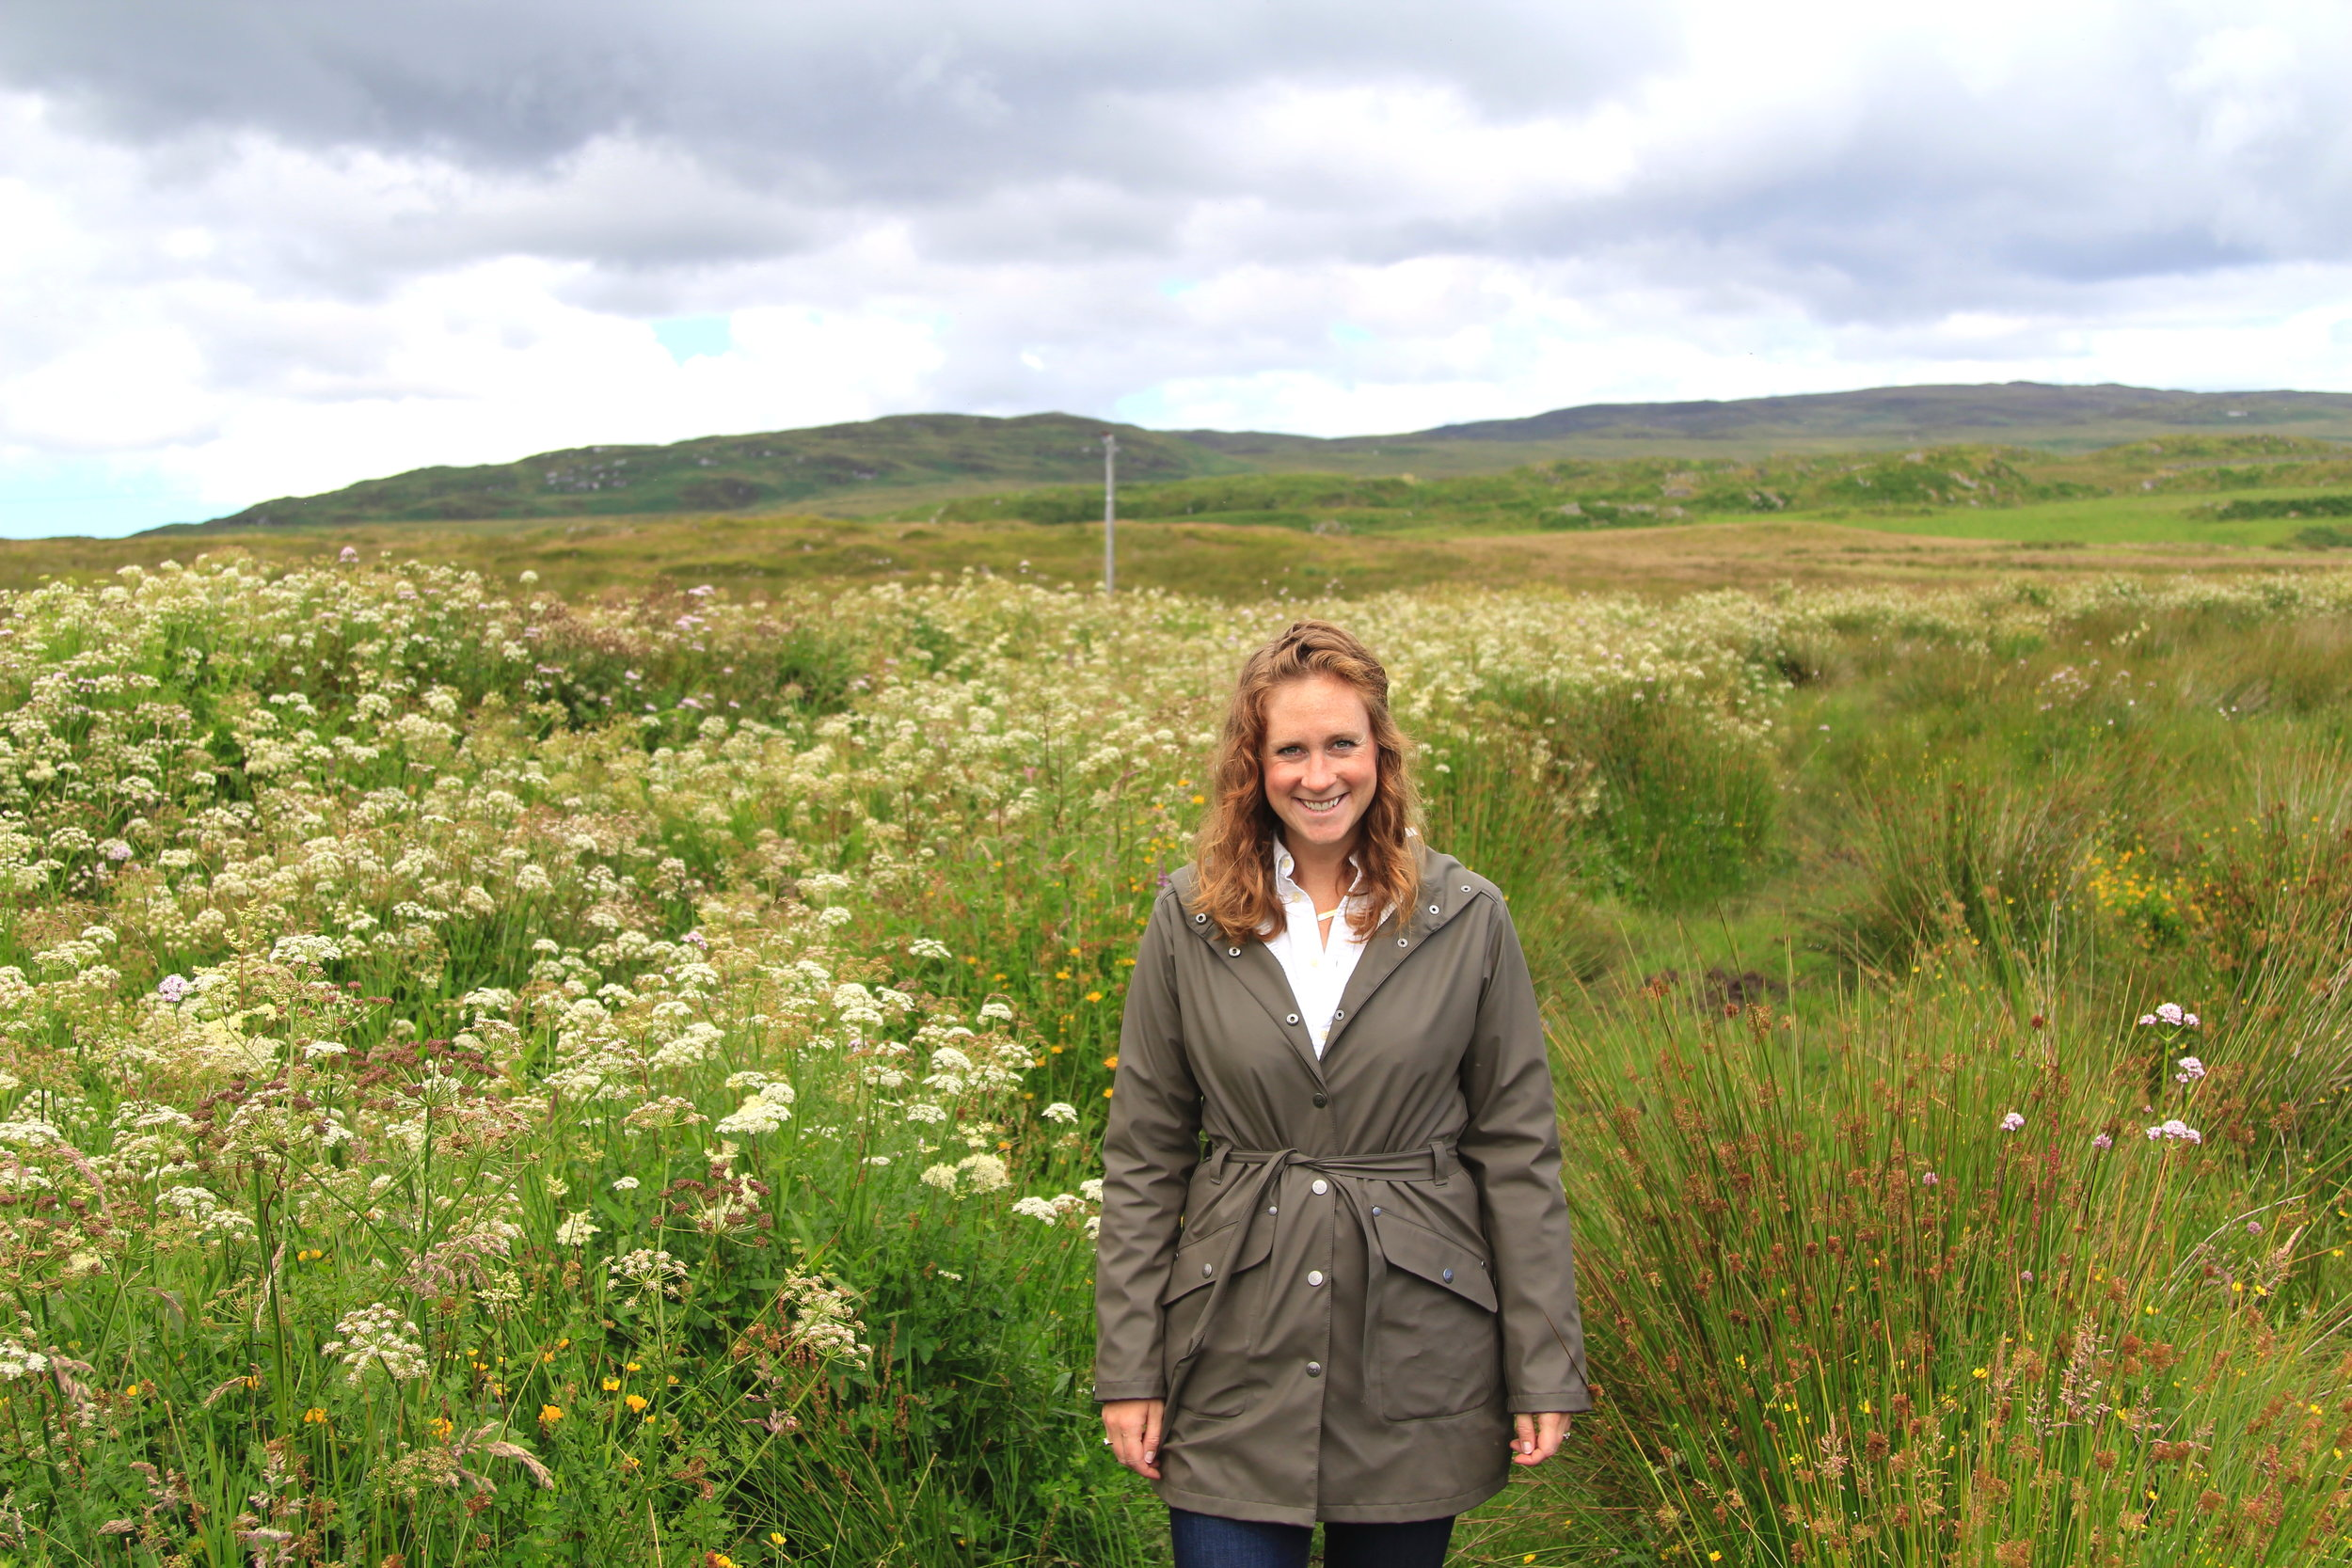 Laphroaig plots, Islay, Scotland